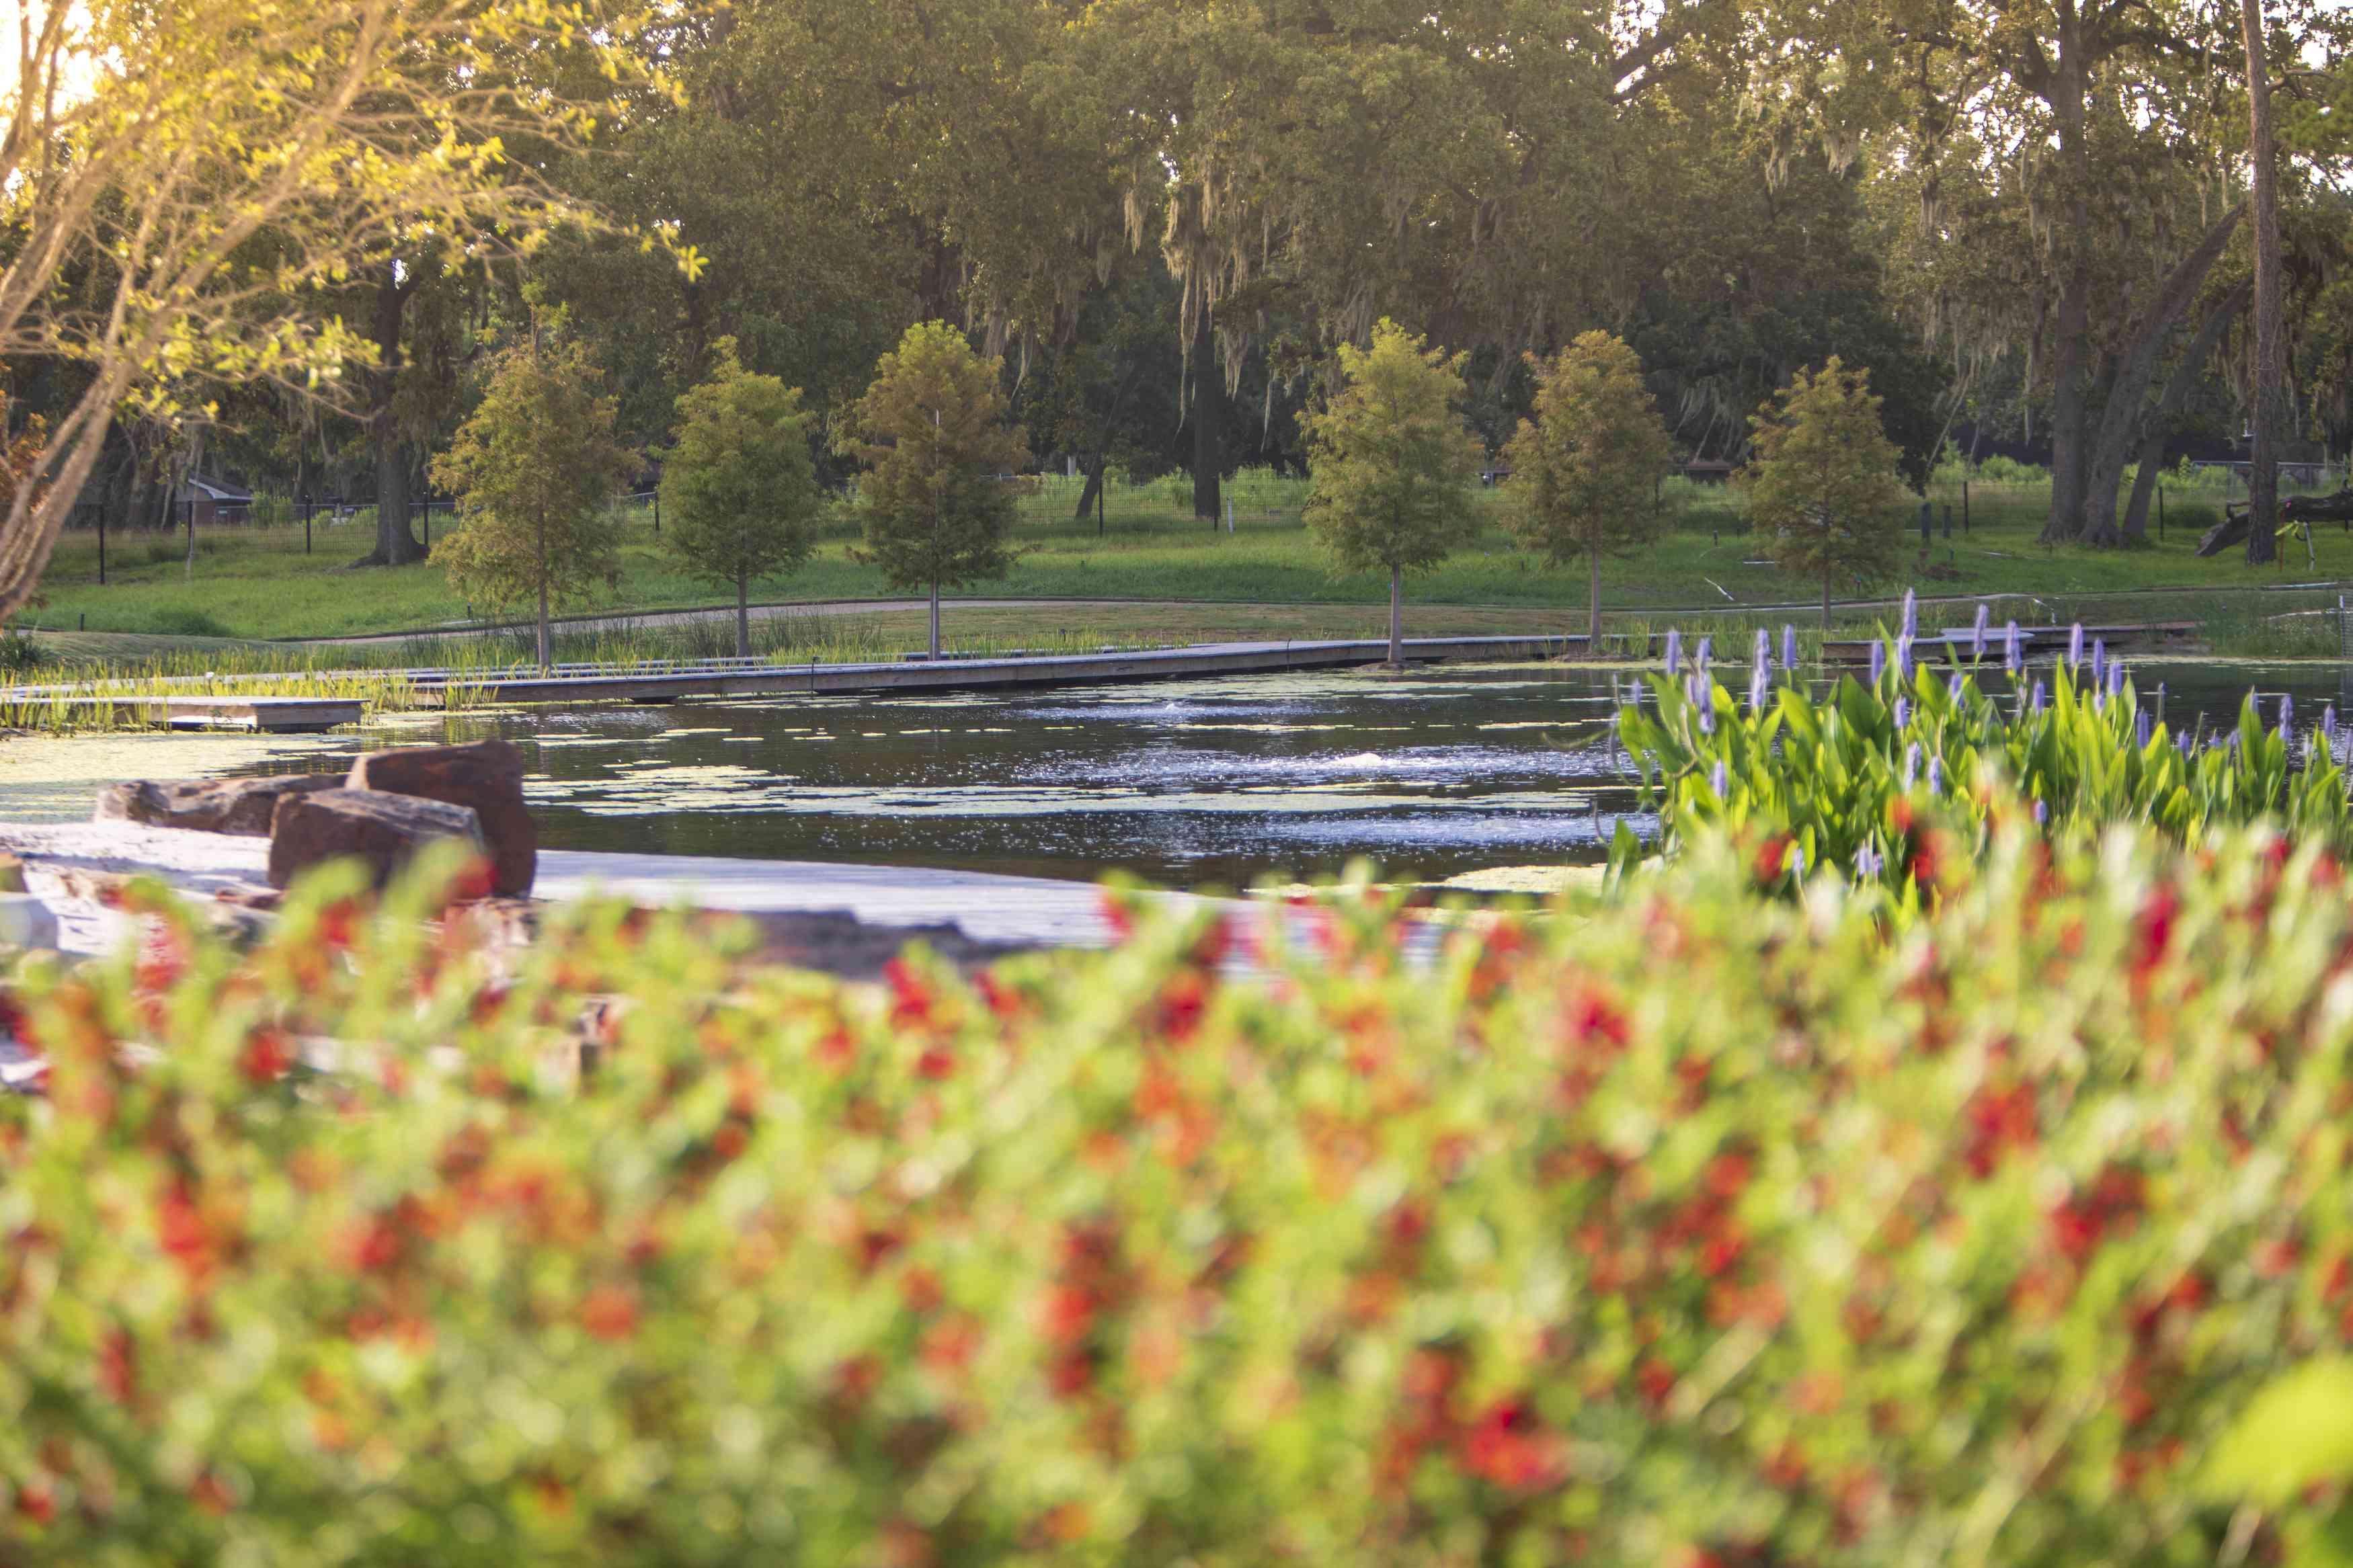 View of the pond at Houston Botanic Garden